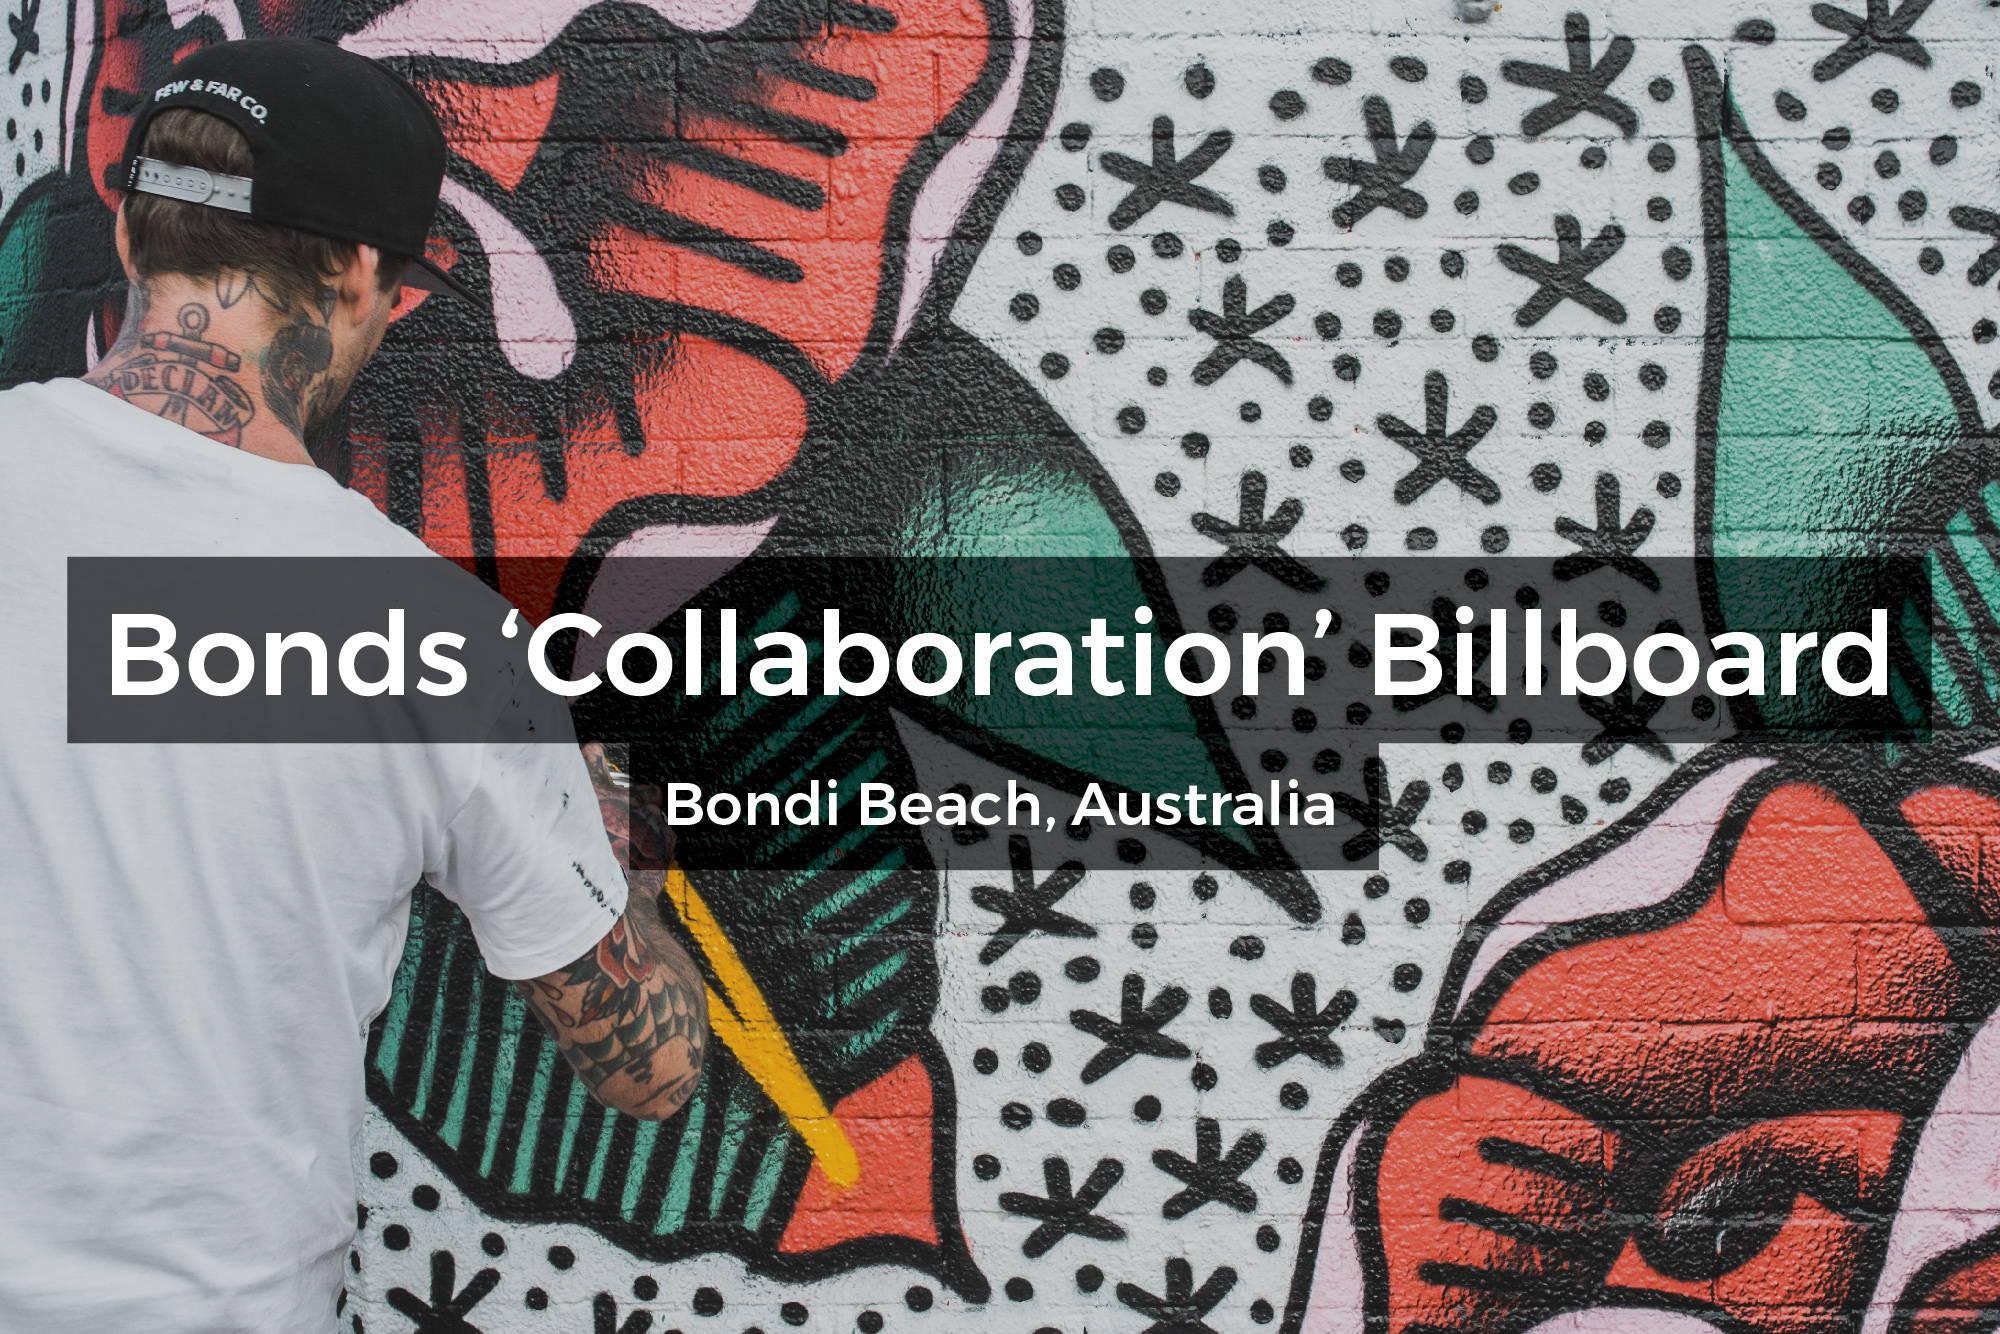 Bonds Collaboration launch mural in Bondi Beach, Australia by Steen Jones